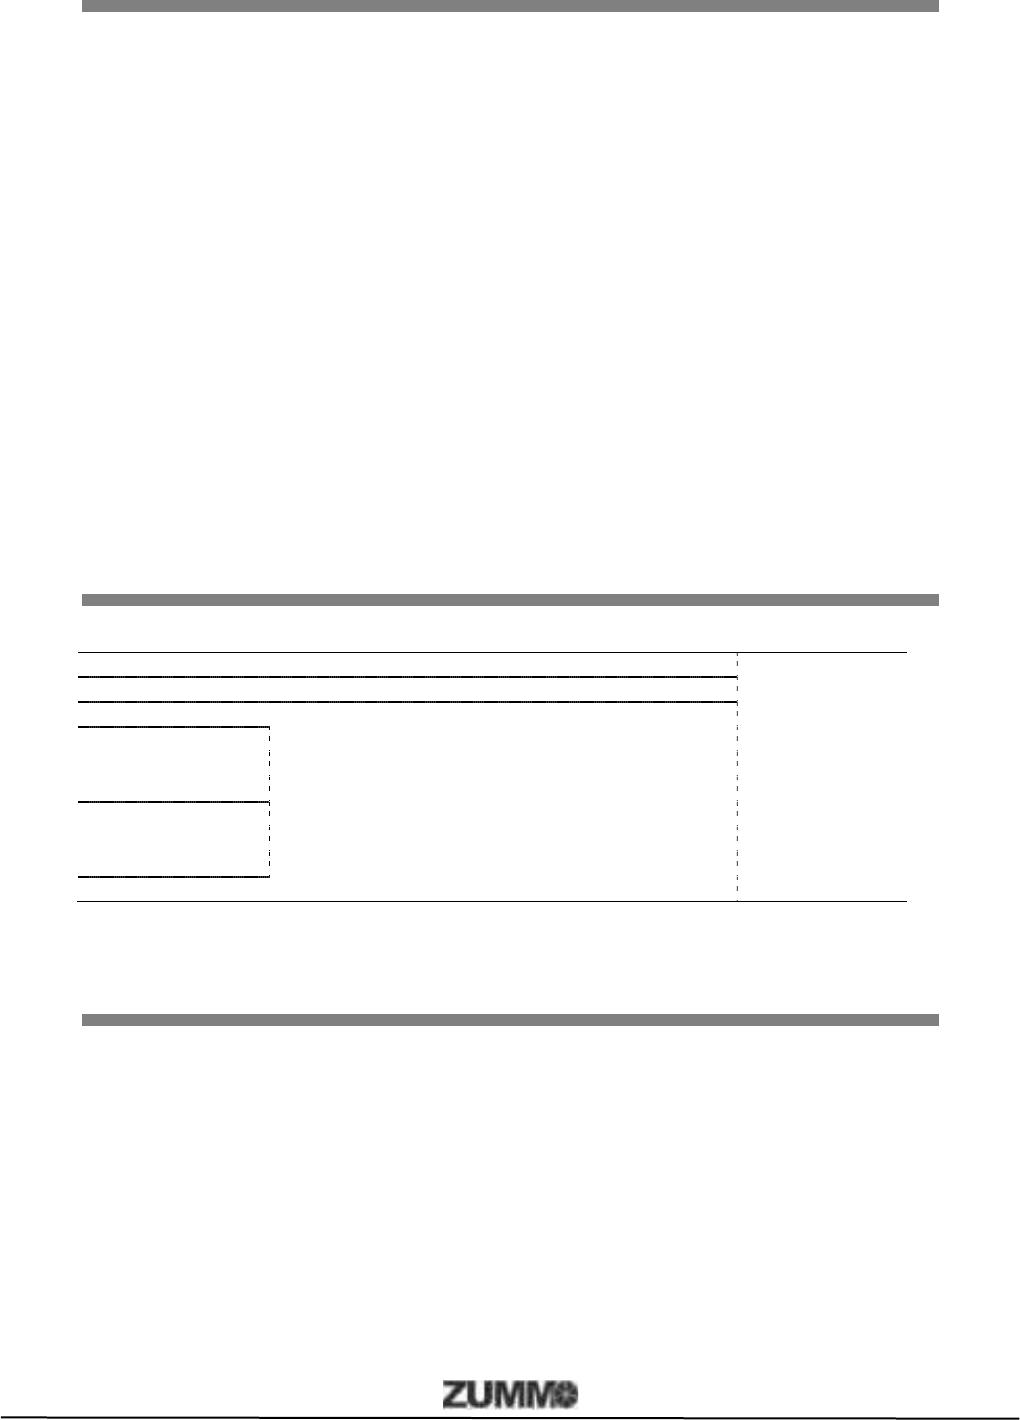 Internet appuntamenti nome idee